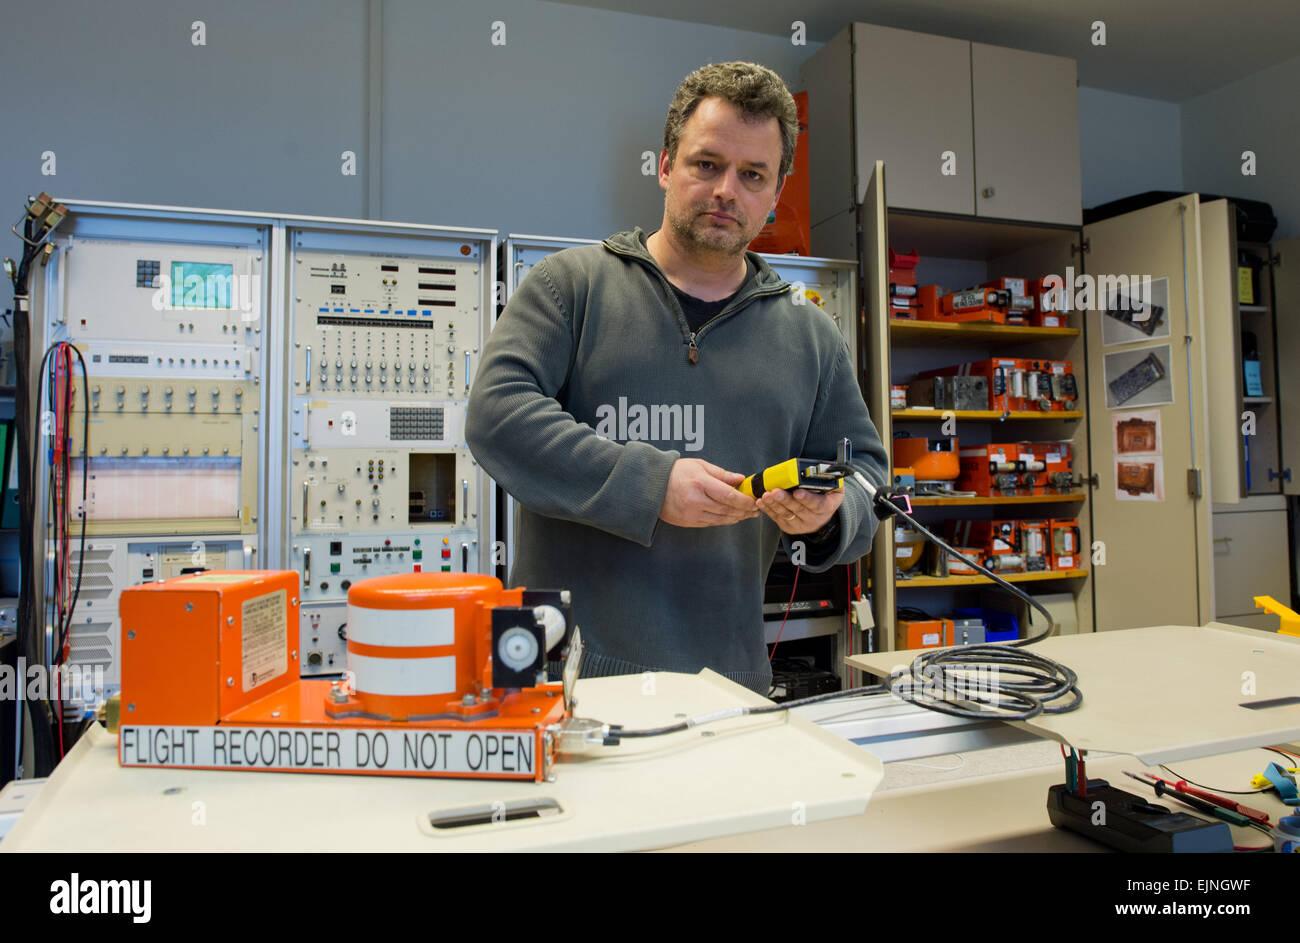 Braunschweig, Germany. 30th Mar, 2015. Jens Friedmann shows a flight recorder at the German Federal Bureau of Aircraft Stock Photo